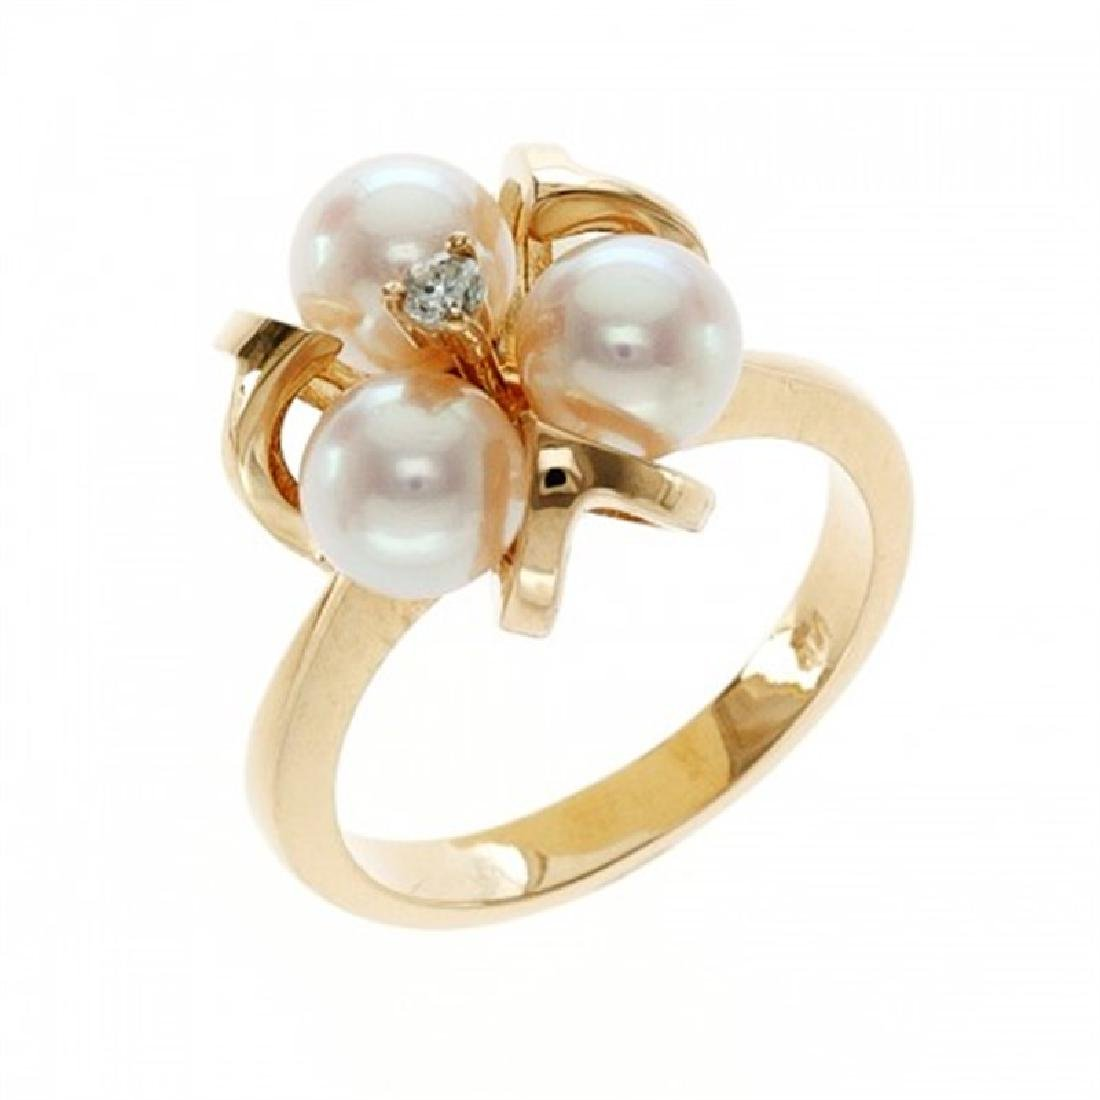 6.0-6.5mm Japanese Akoya Pearl Ring with Diamond